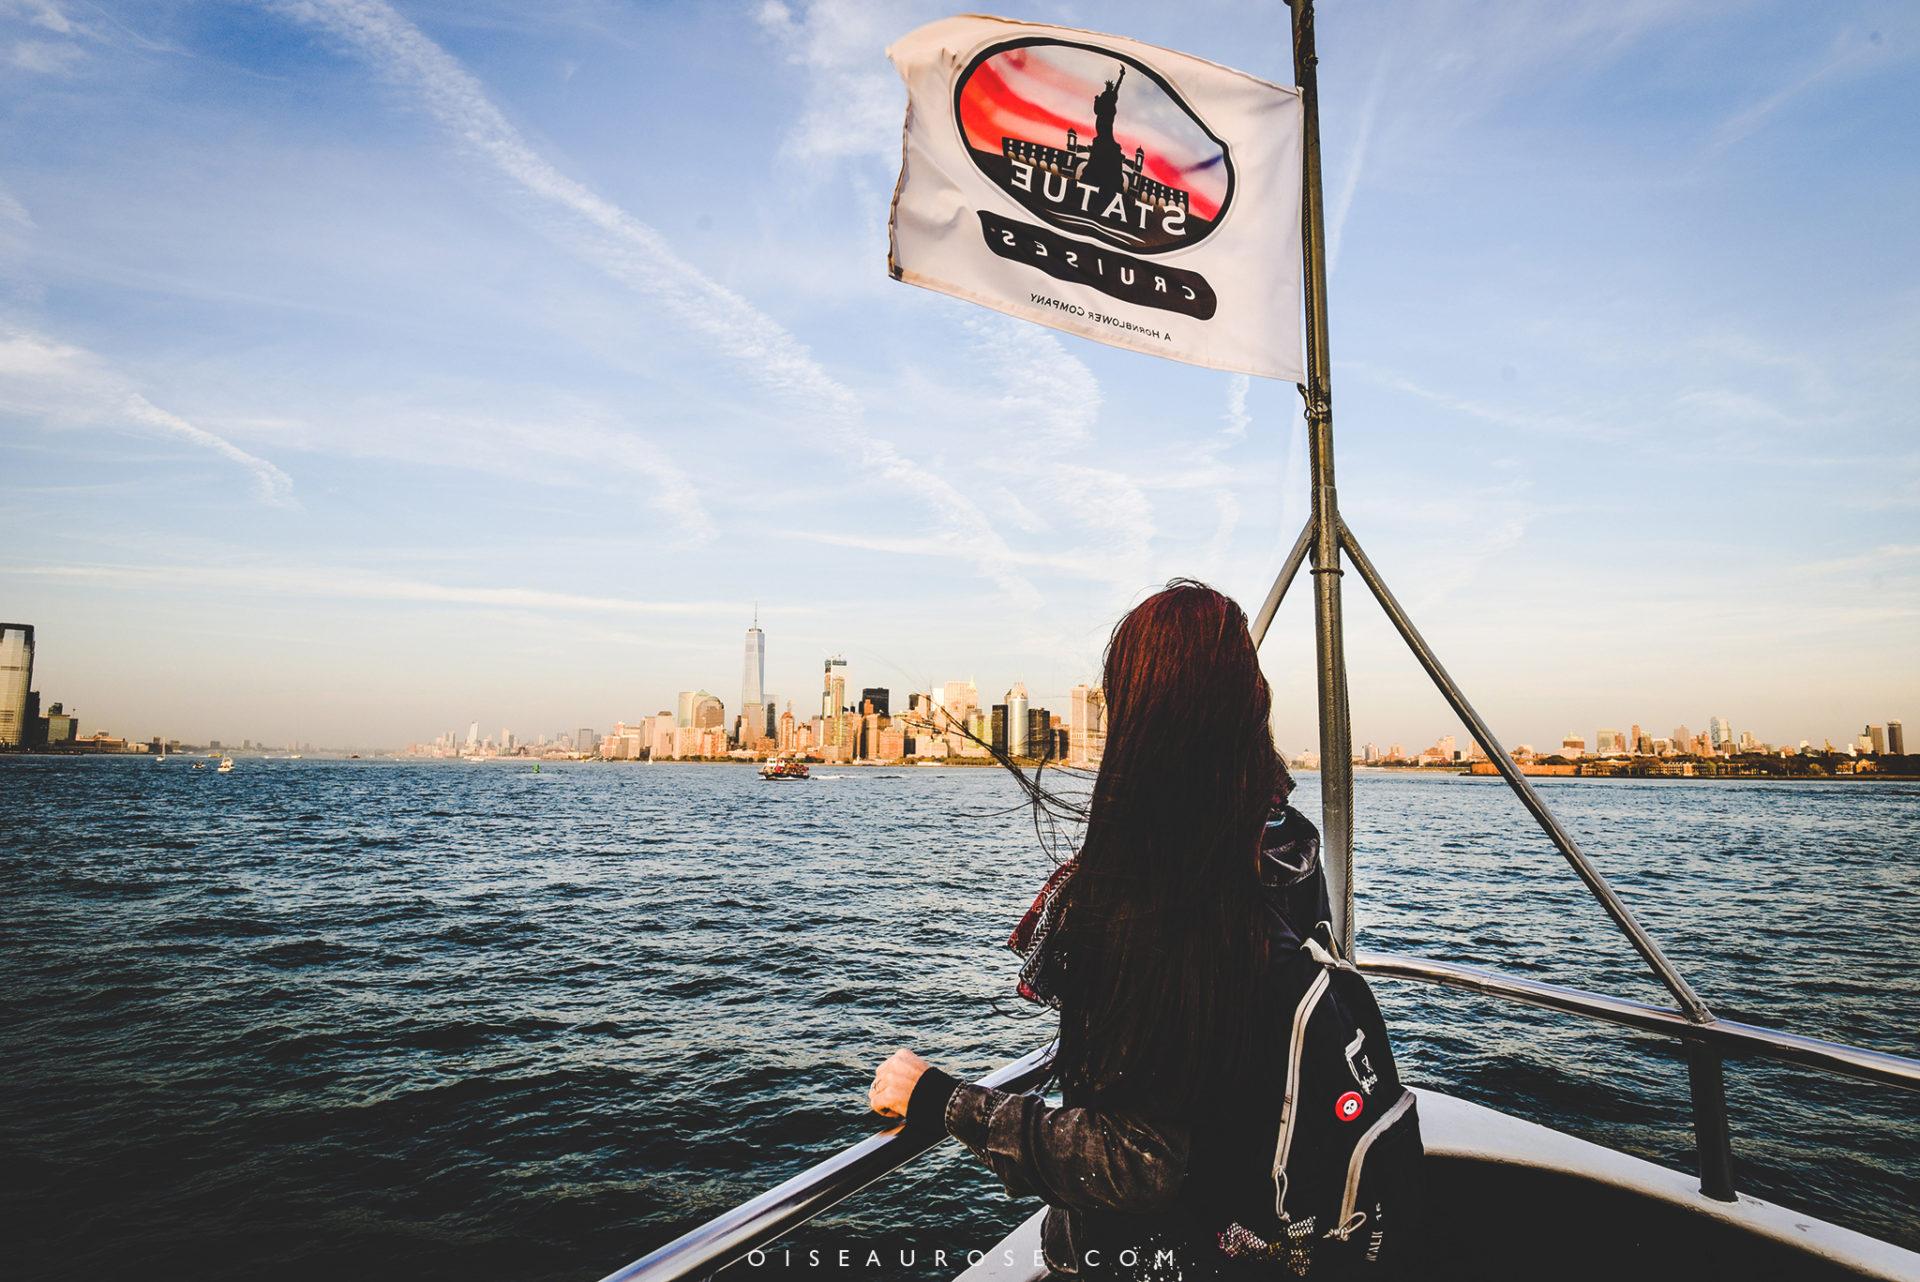 1-prendre-bateau-pour-statue-liberte-new-york